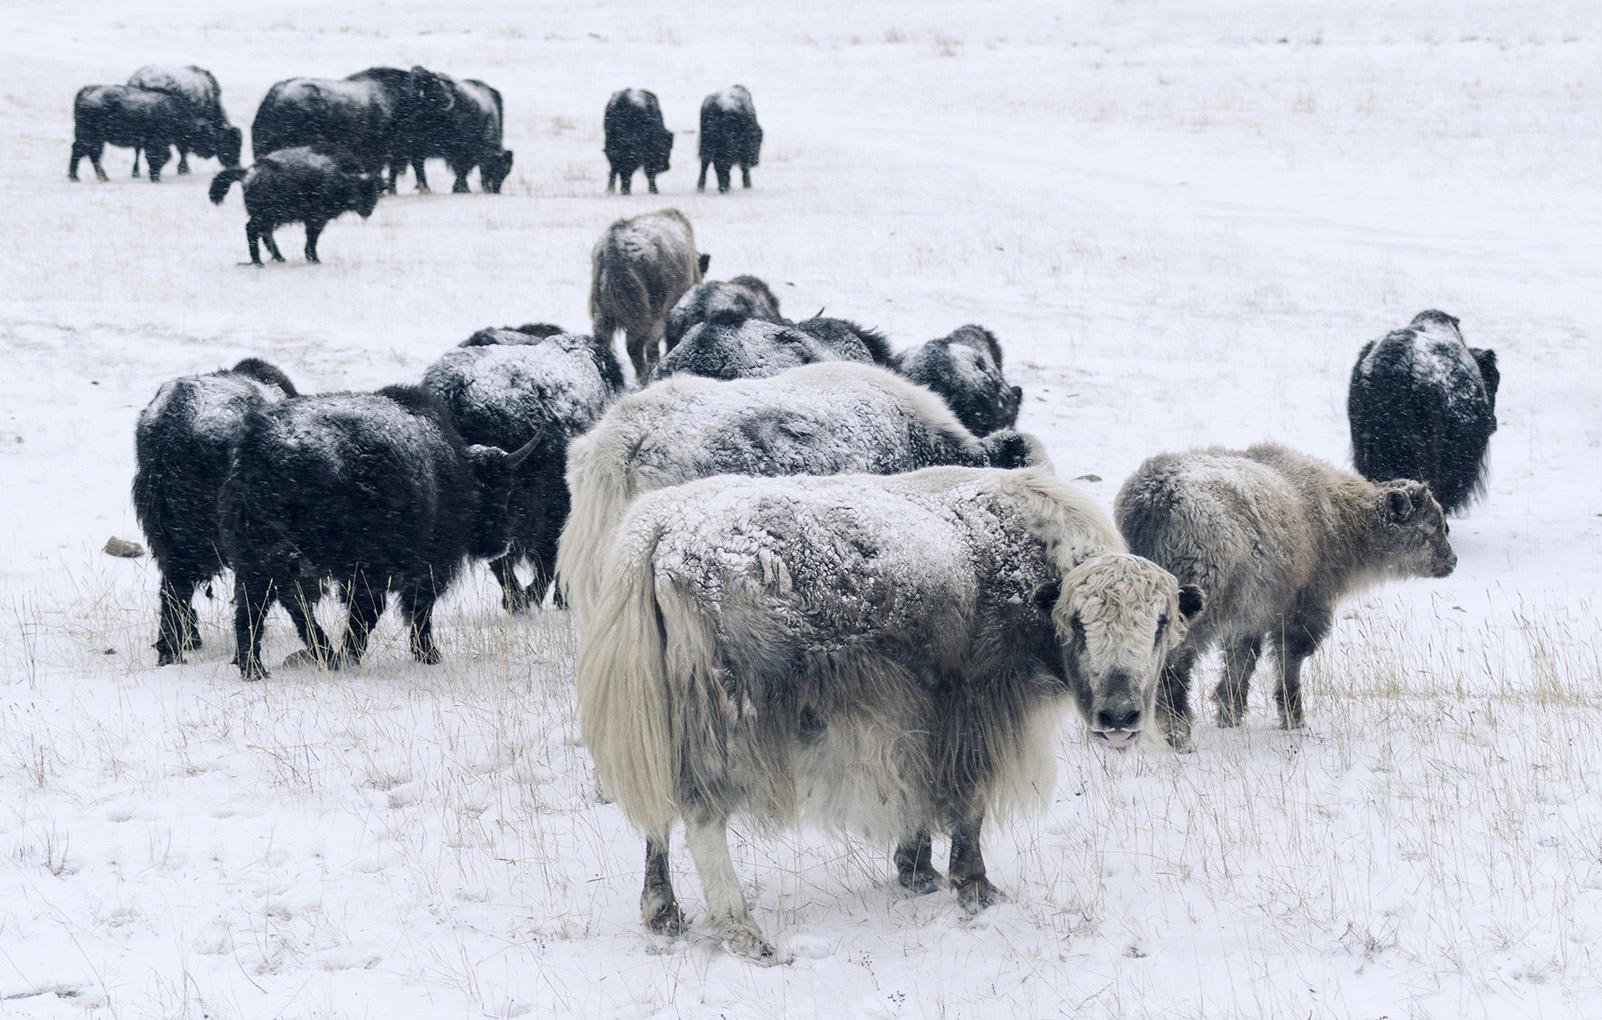 tengri_khangai_noble_yak_winter.jpg